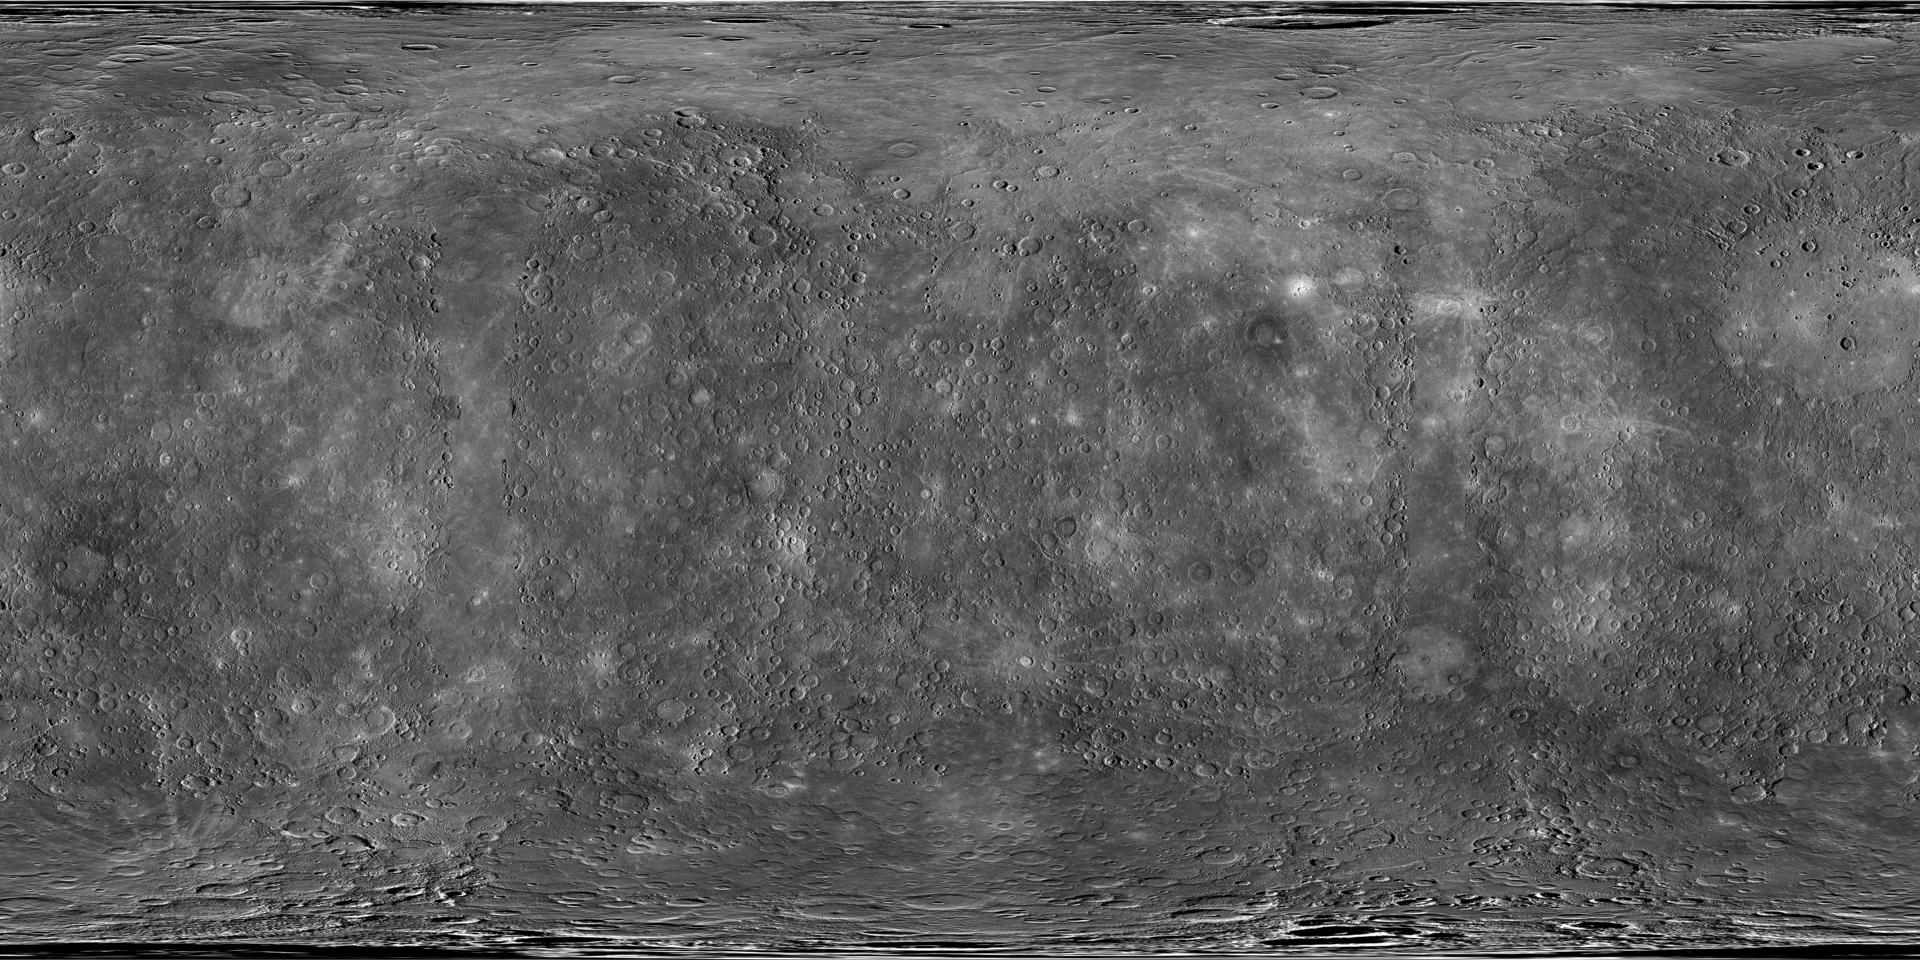 Mercury Planet Wikimedia Commons